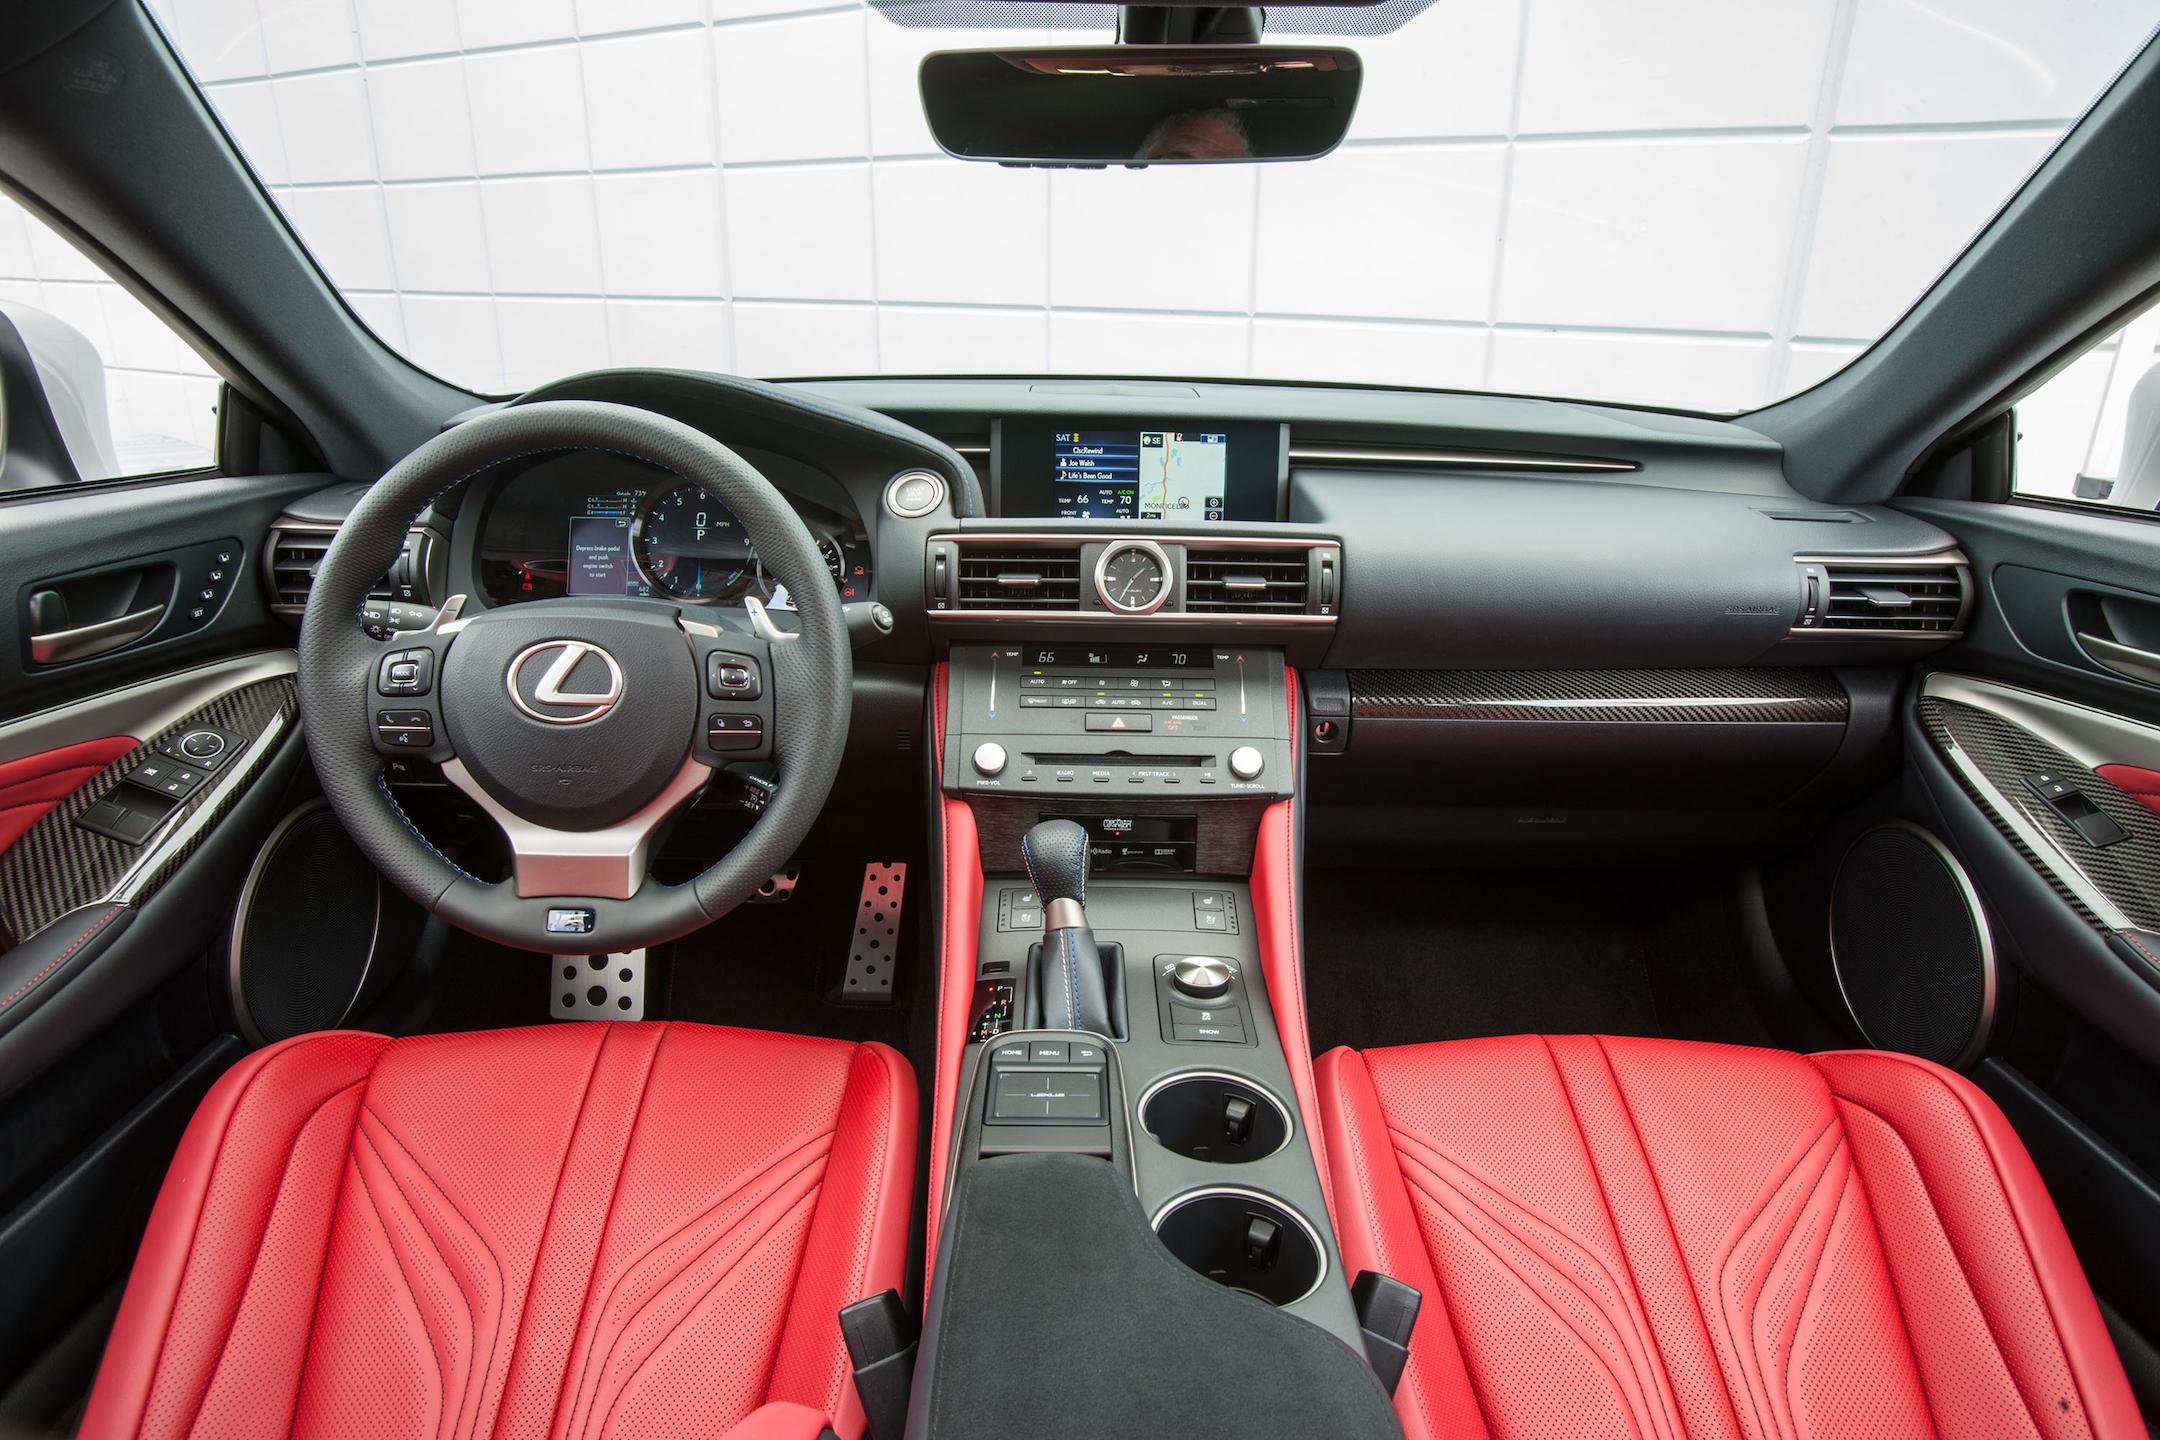 2019_Lexus_RC_F_023_3DBBBC7D093AD433B91ED960B6F3BF8D9D8F83C3